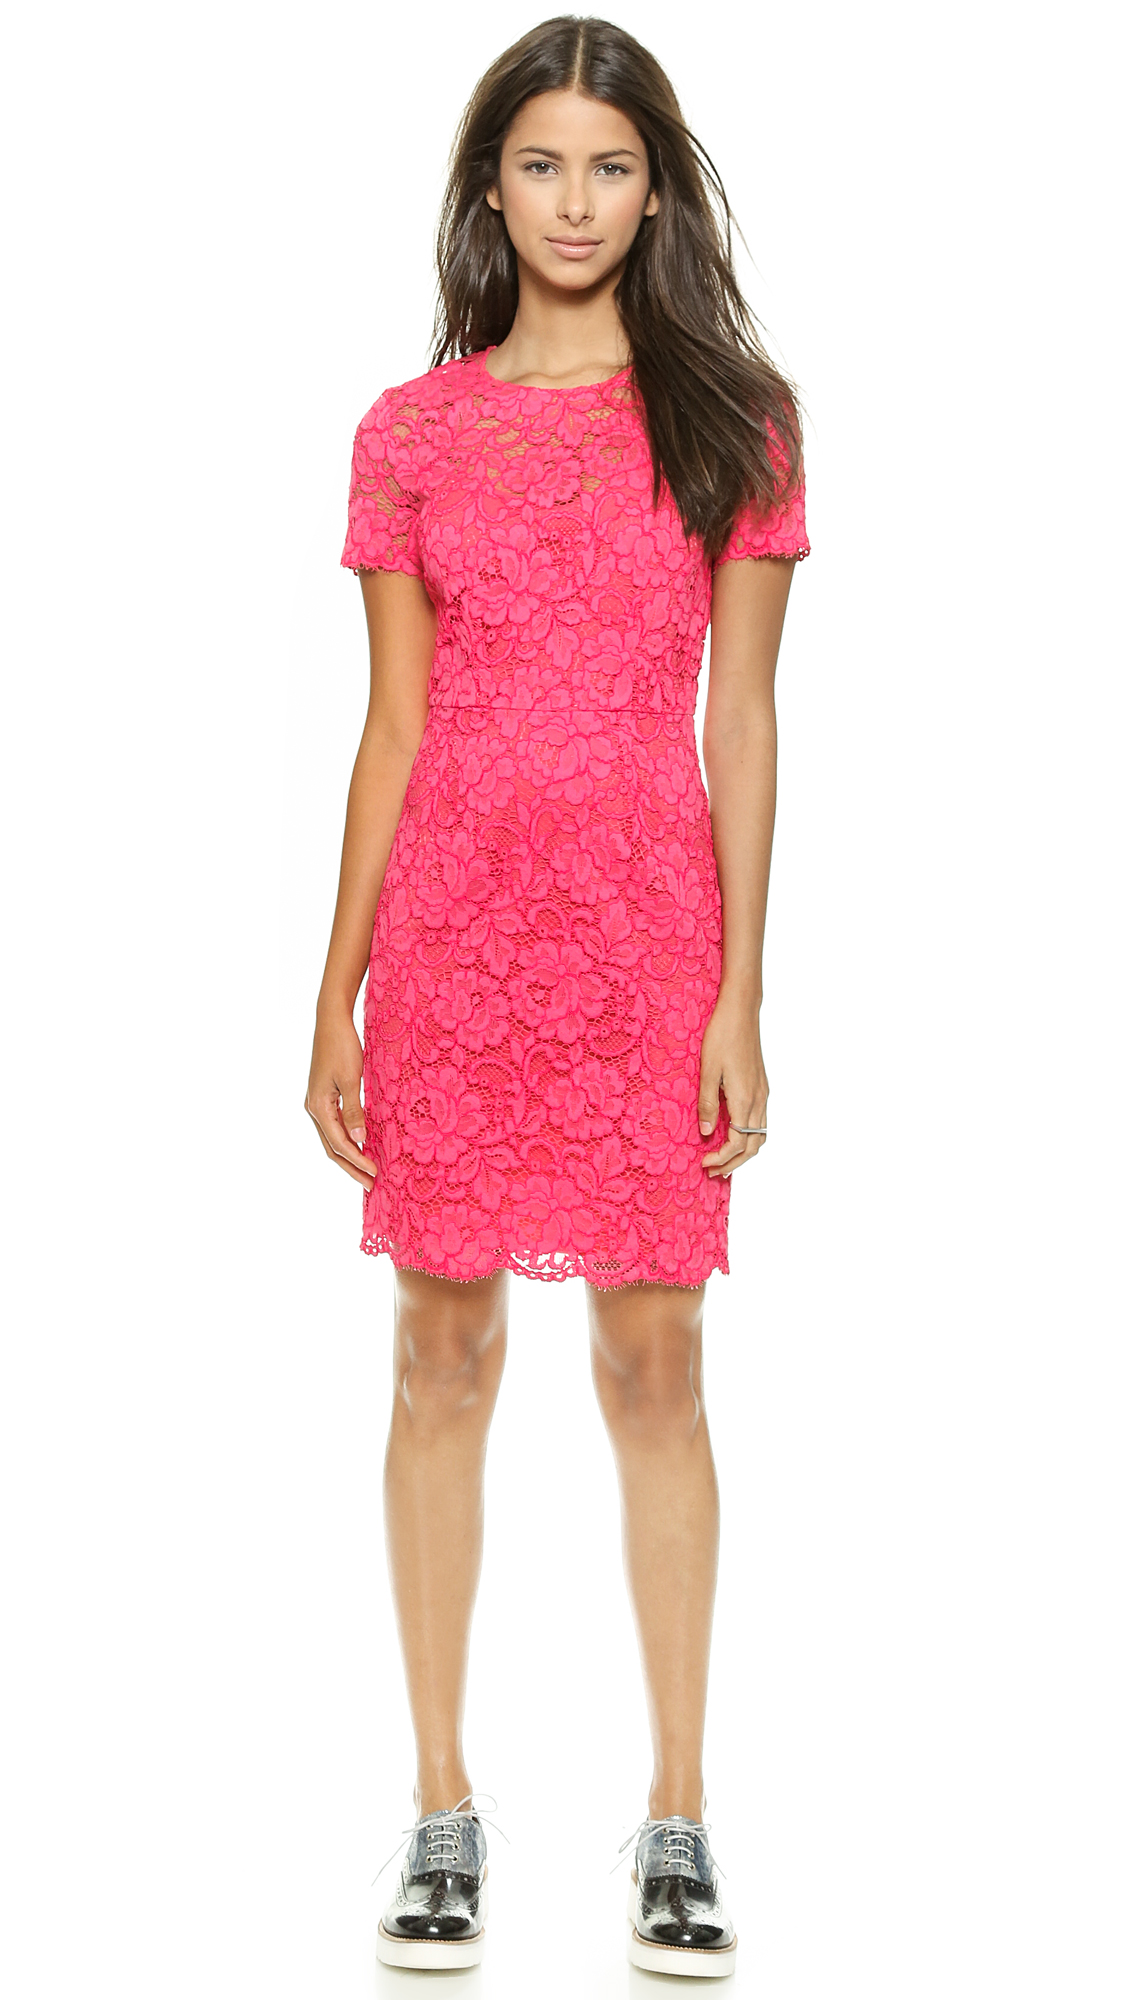 Dkny Lace Sheath Dress Shopbop